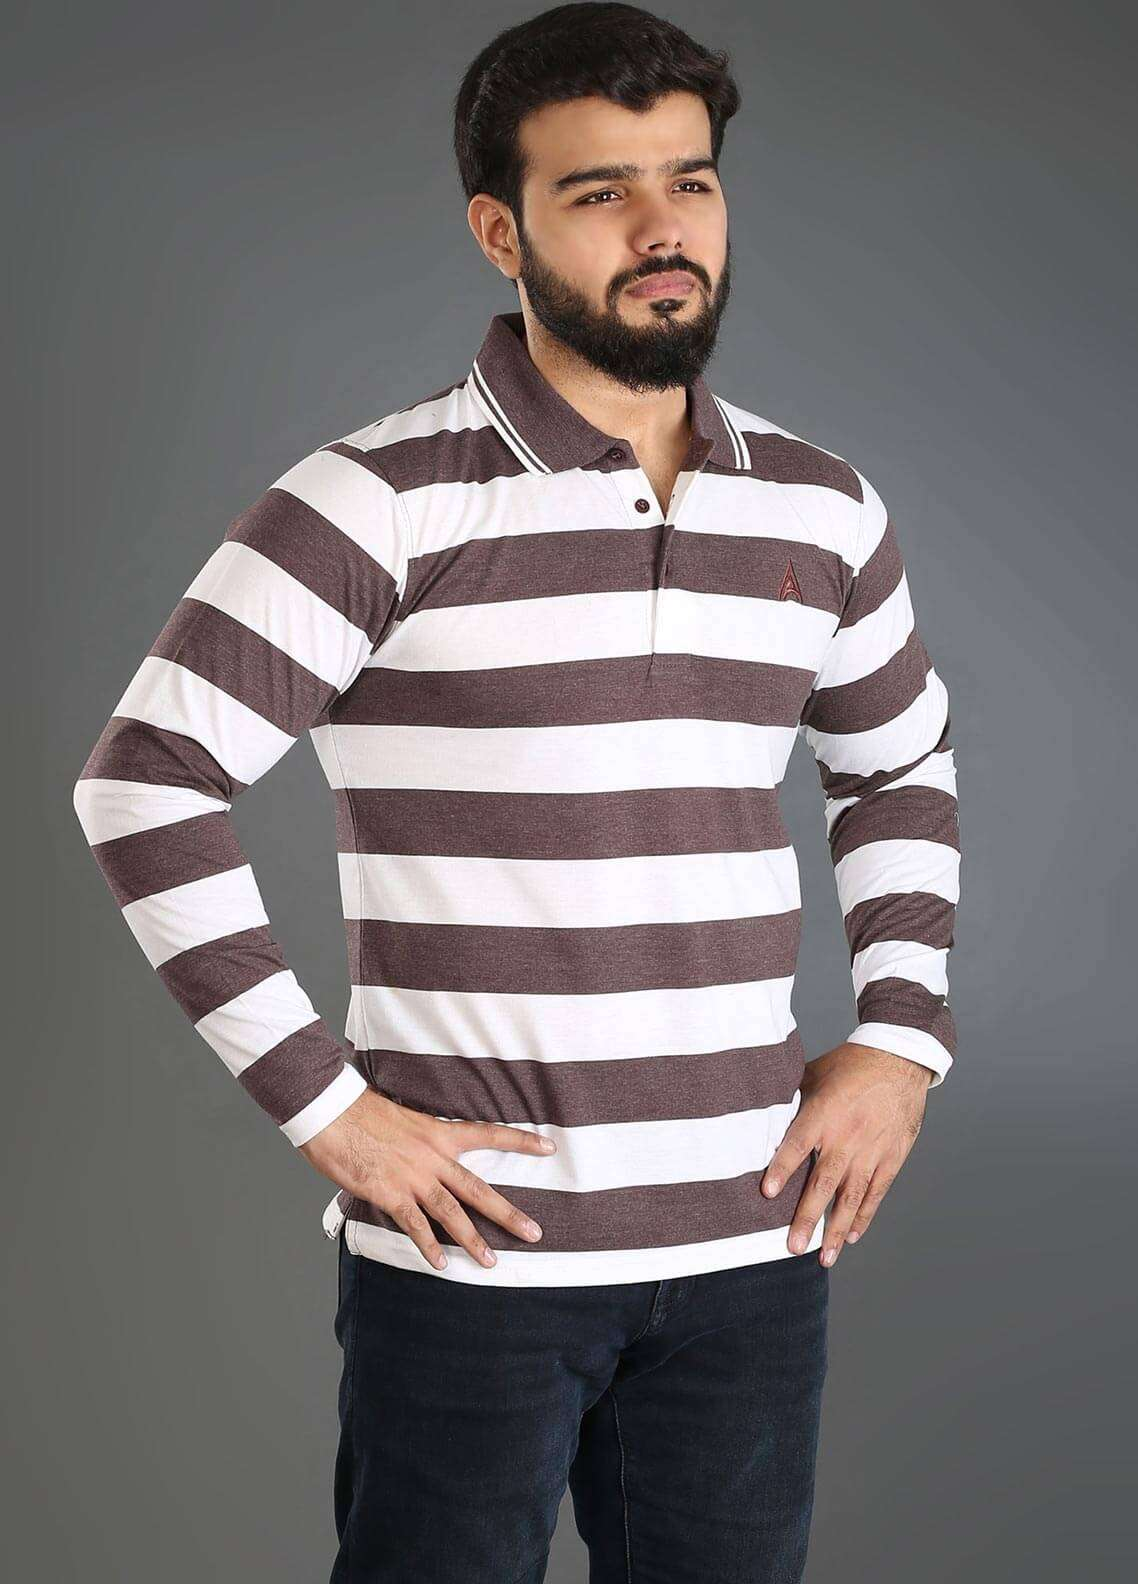 Anchor Jersey Polo Men T-Shirts - Multi A-230